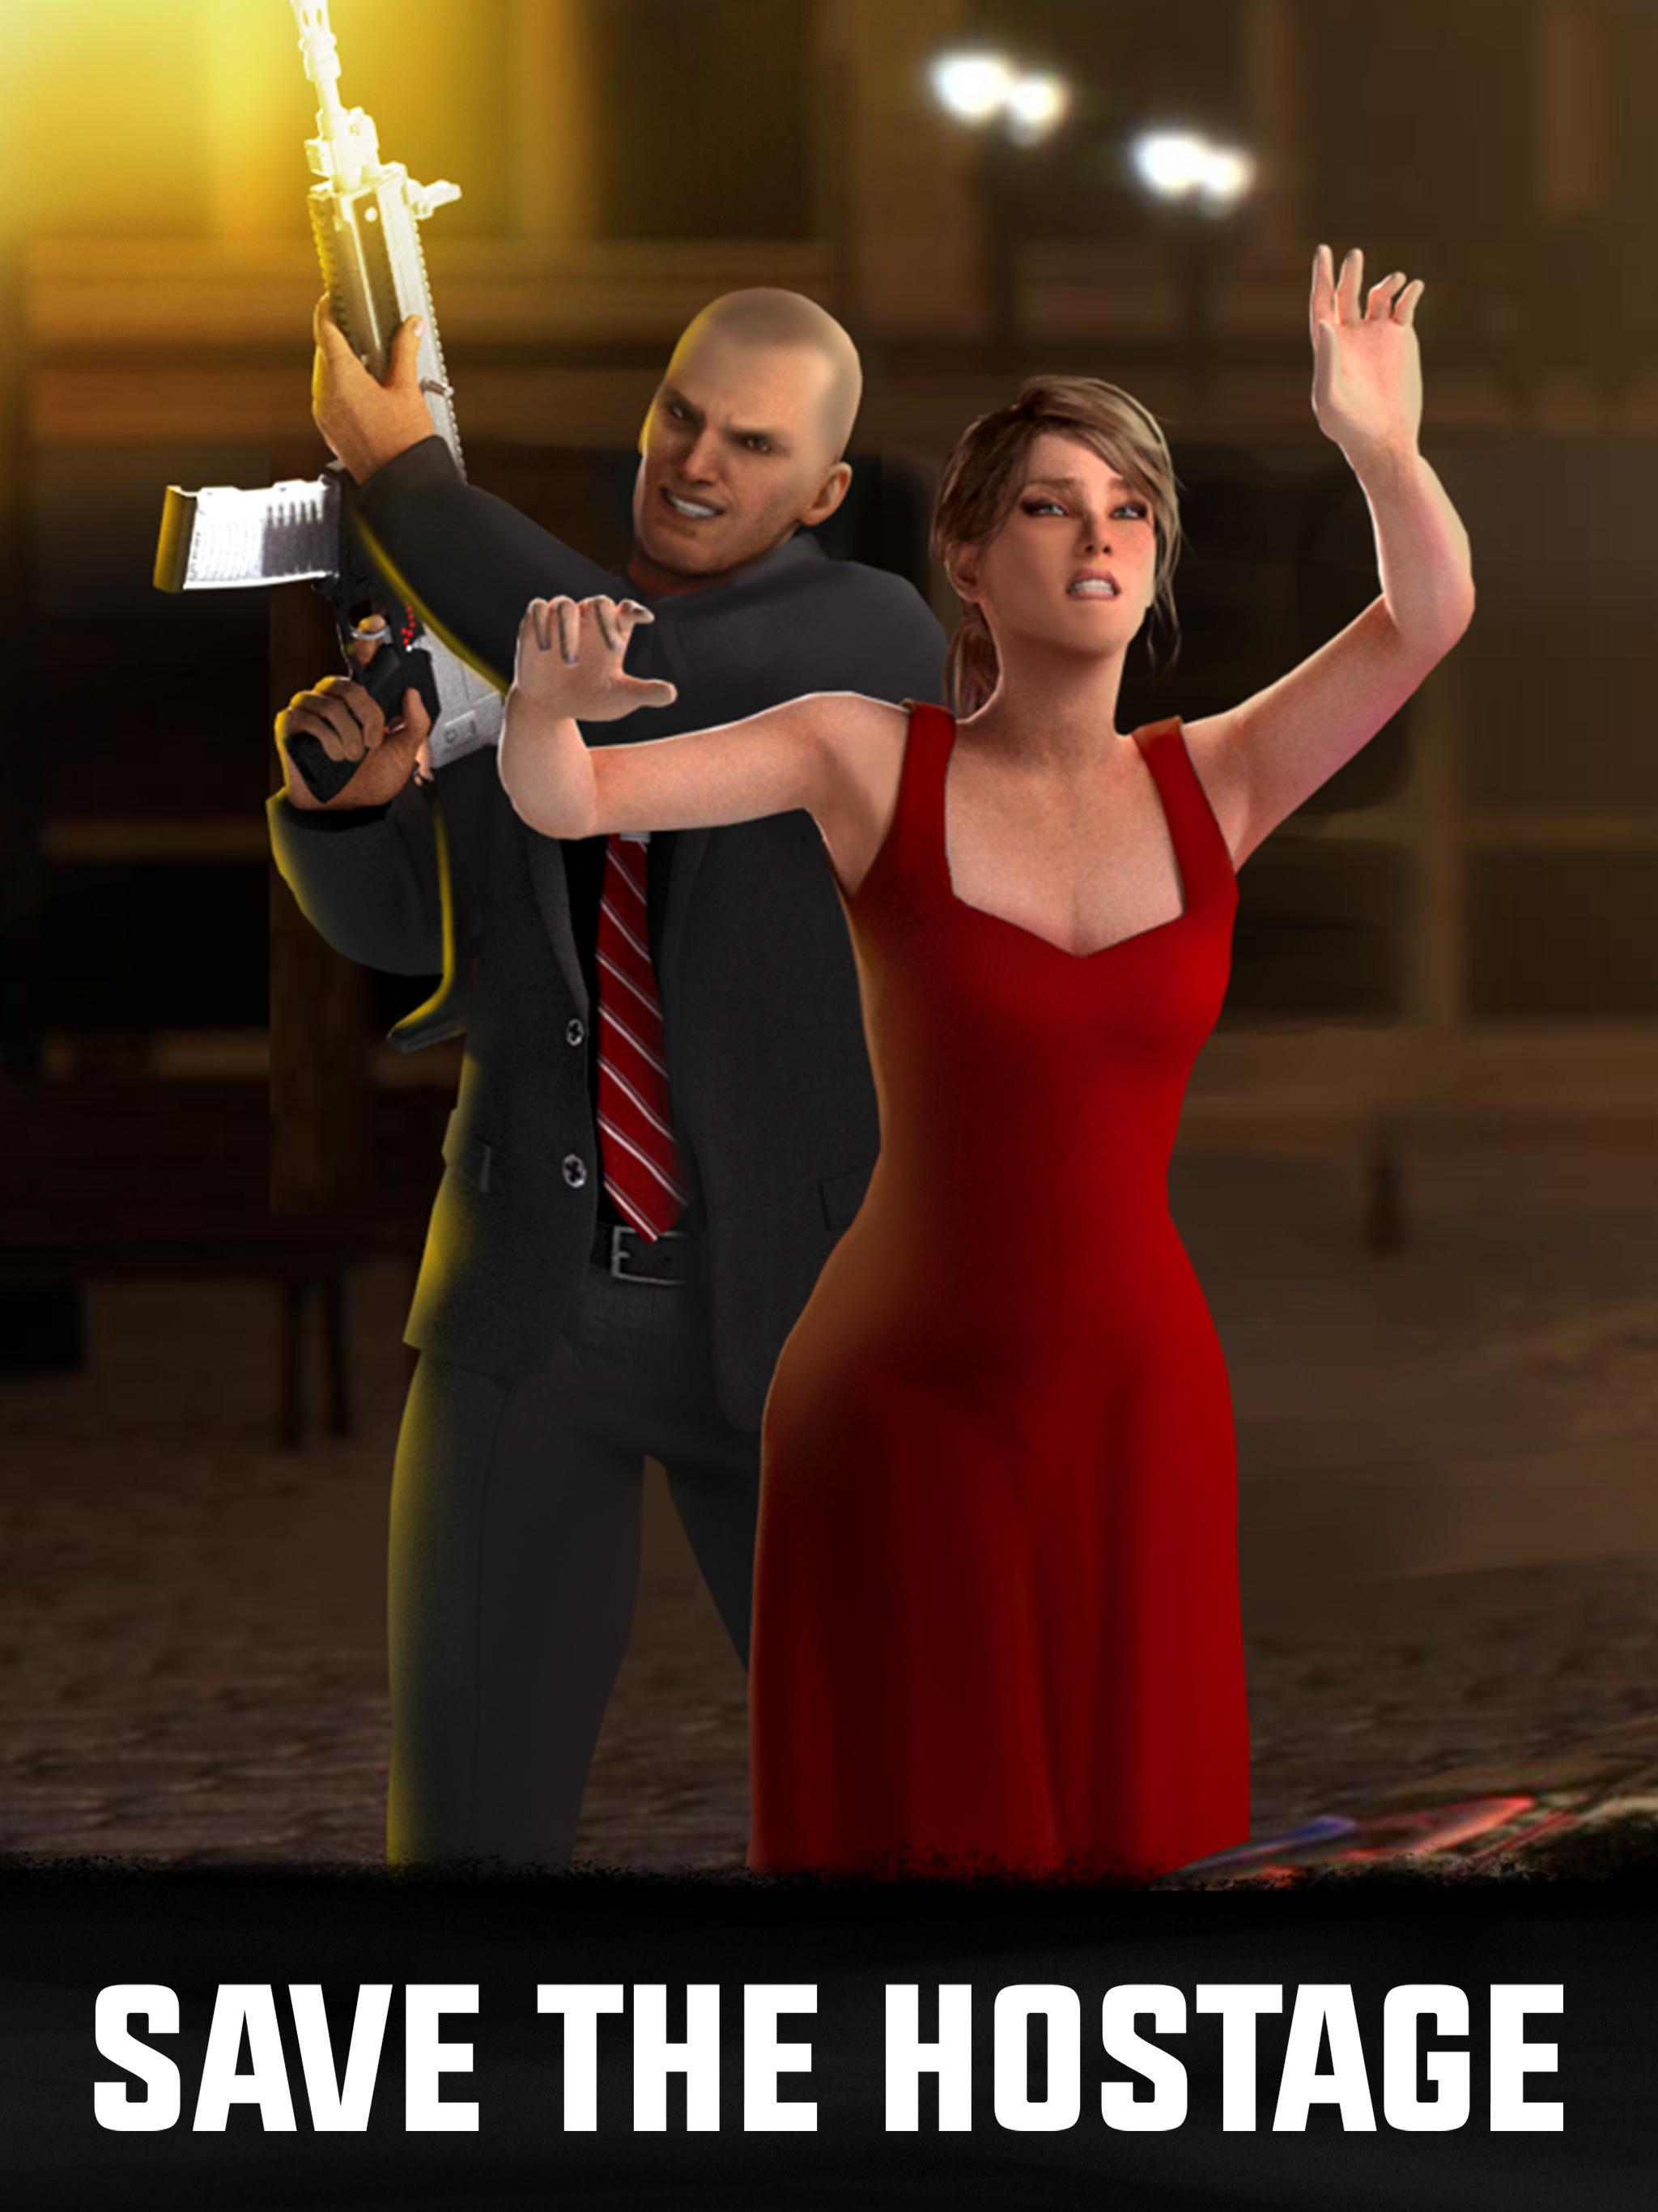 Sniper 3D Fun Free Online FPS Shooting Game 3.15.1 Screenshot 9